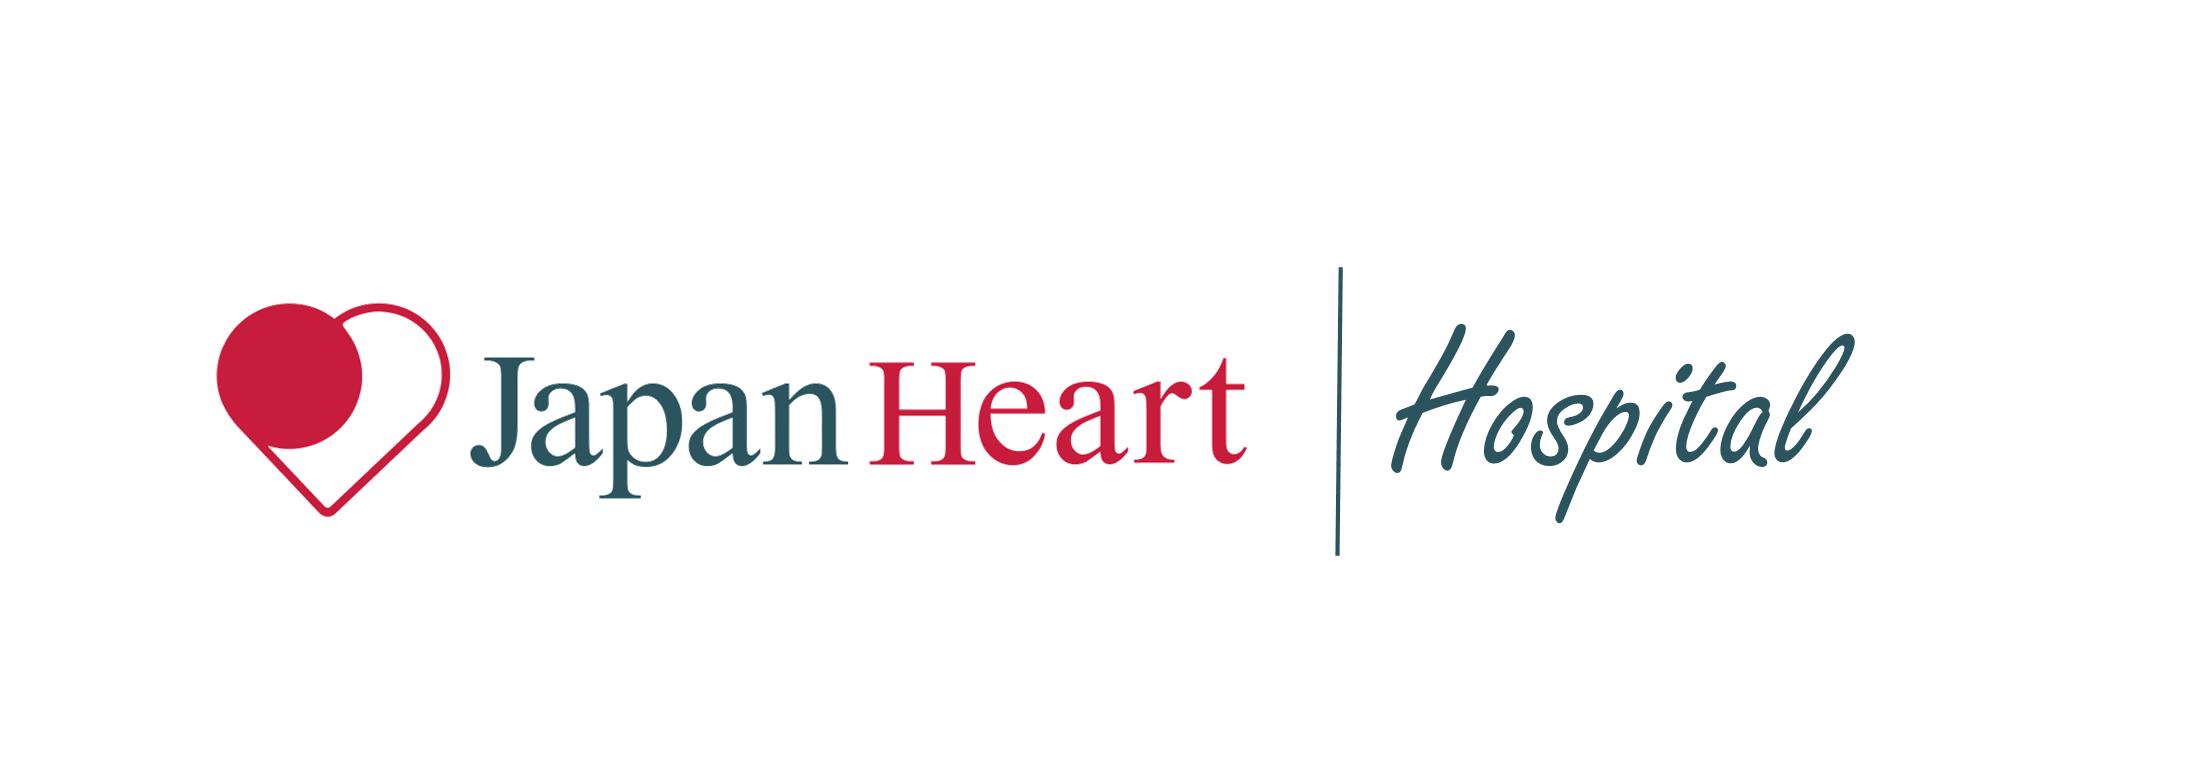 Japan Heart Hospital